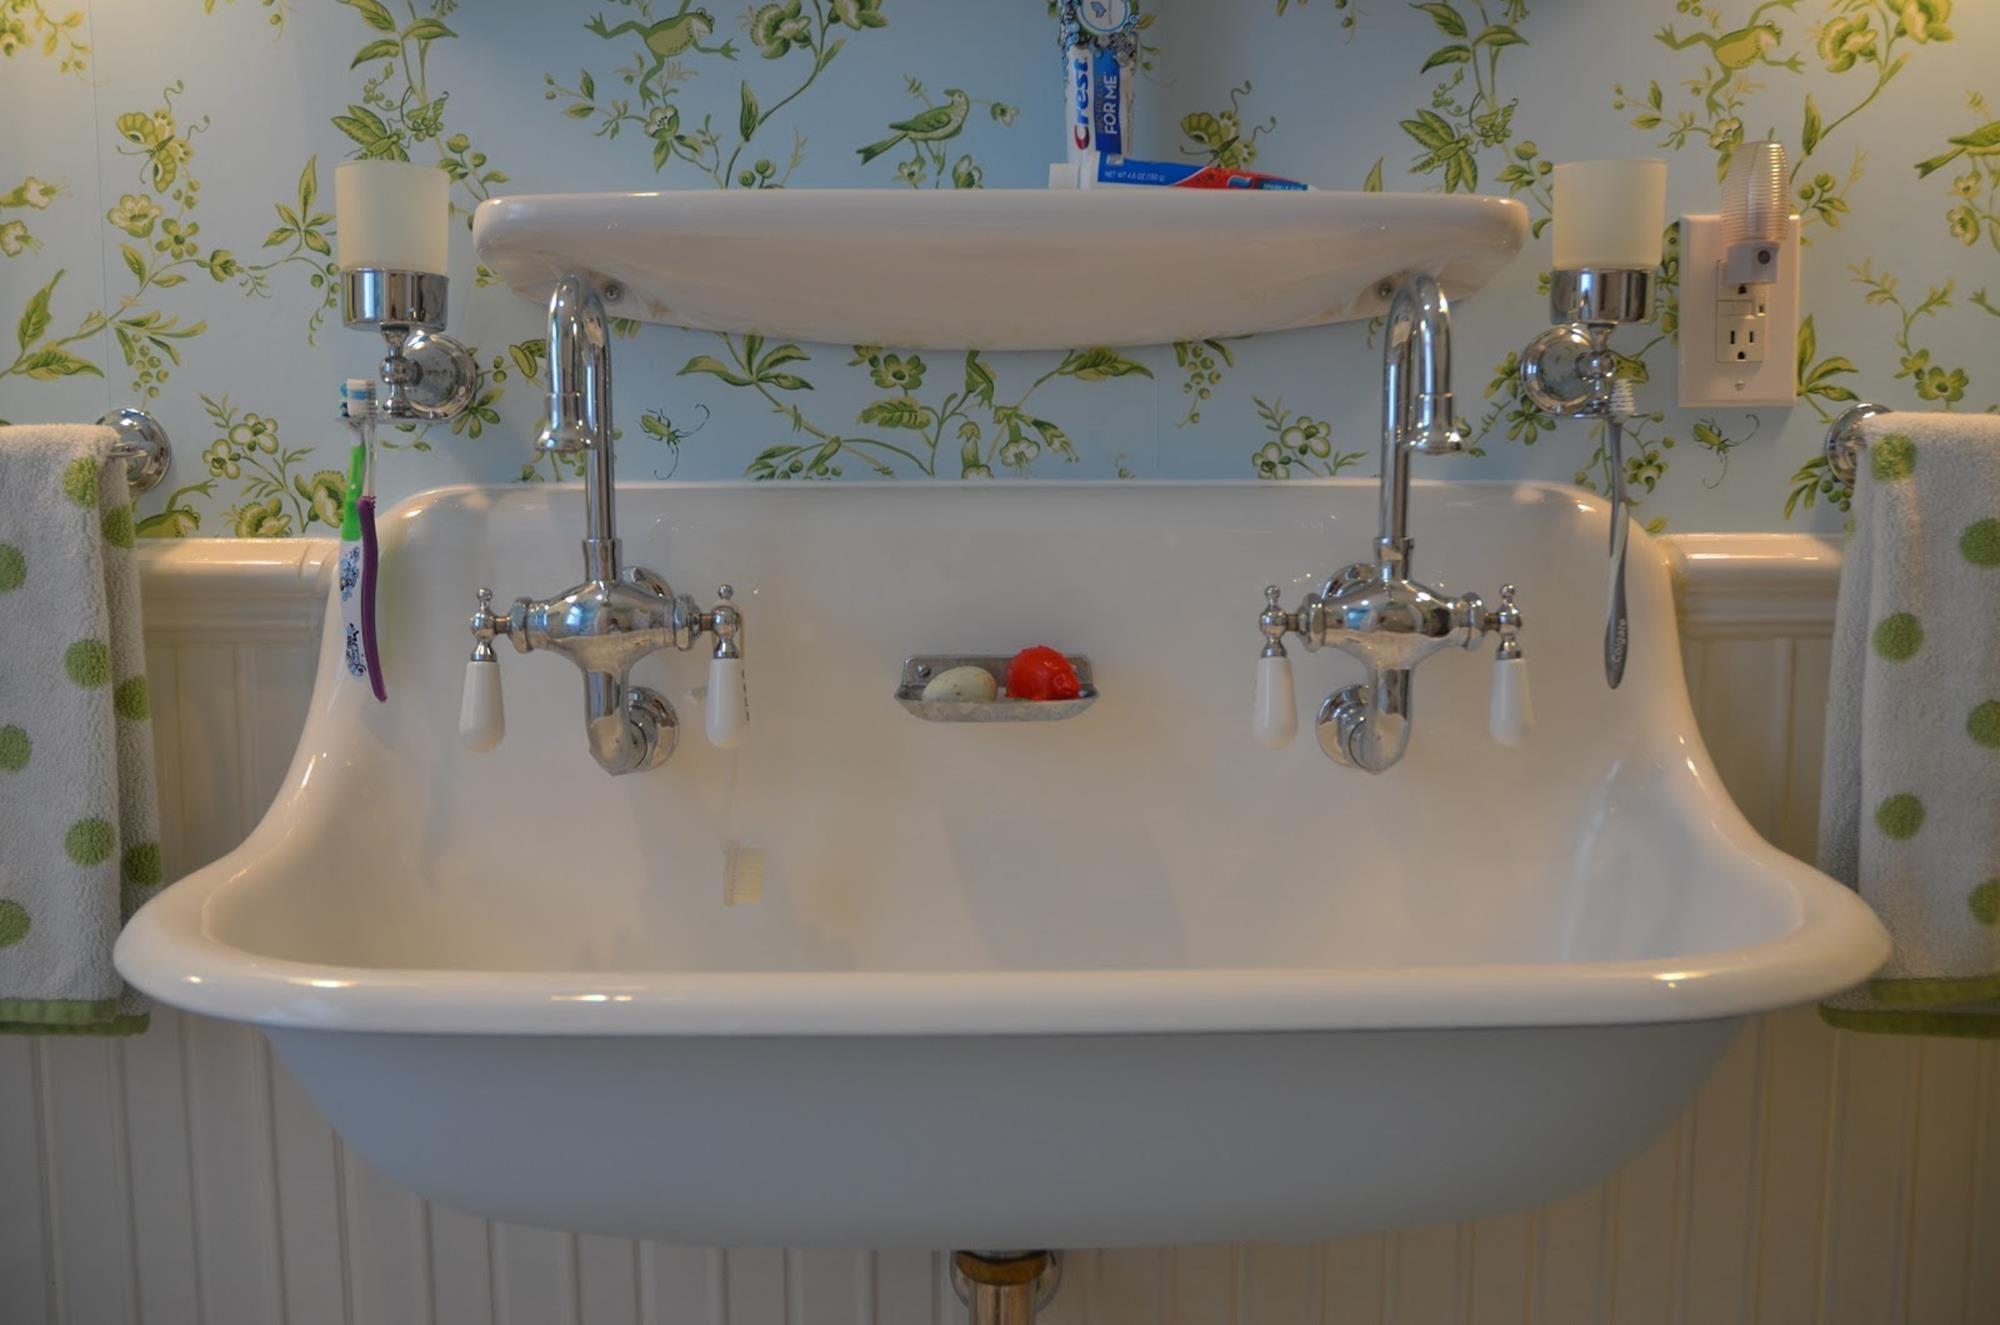 Farmhouse Style Bathroom Sink Ideas 25 In 2020 Vintage Bathroom